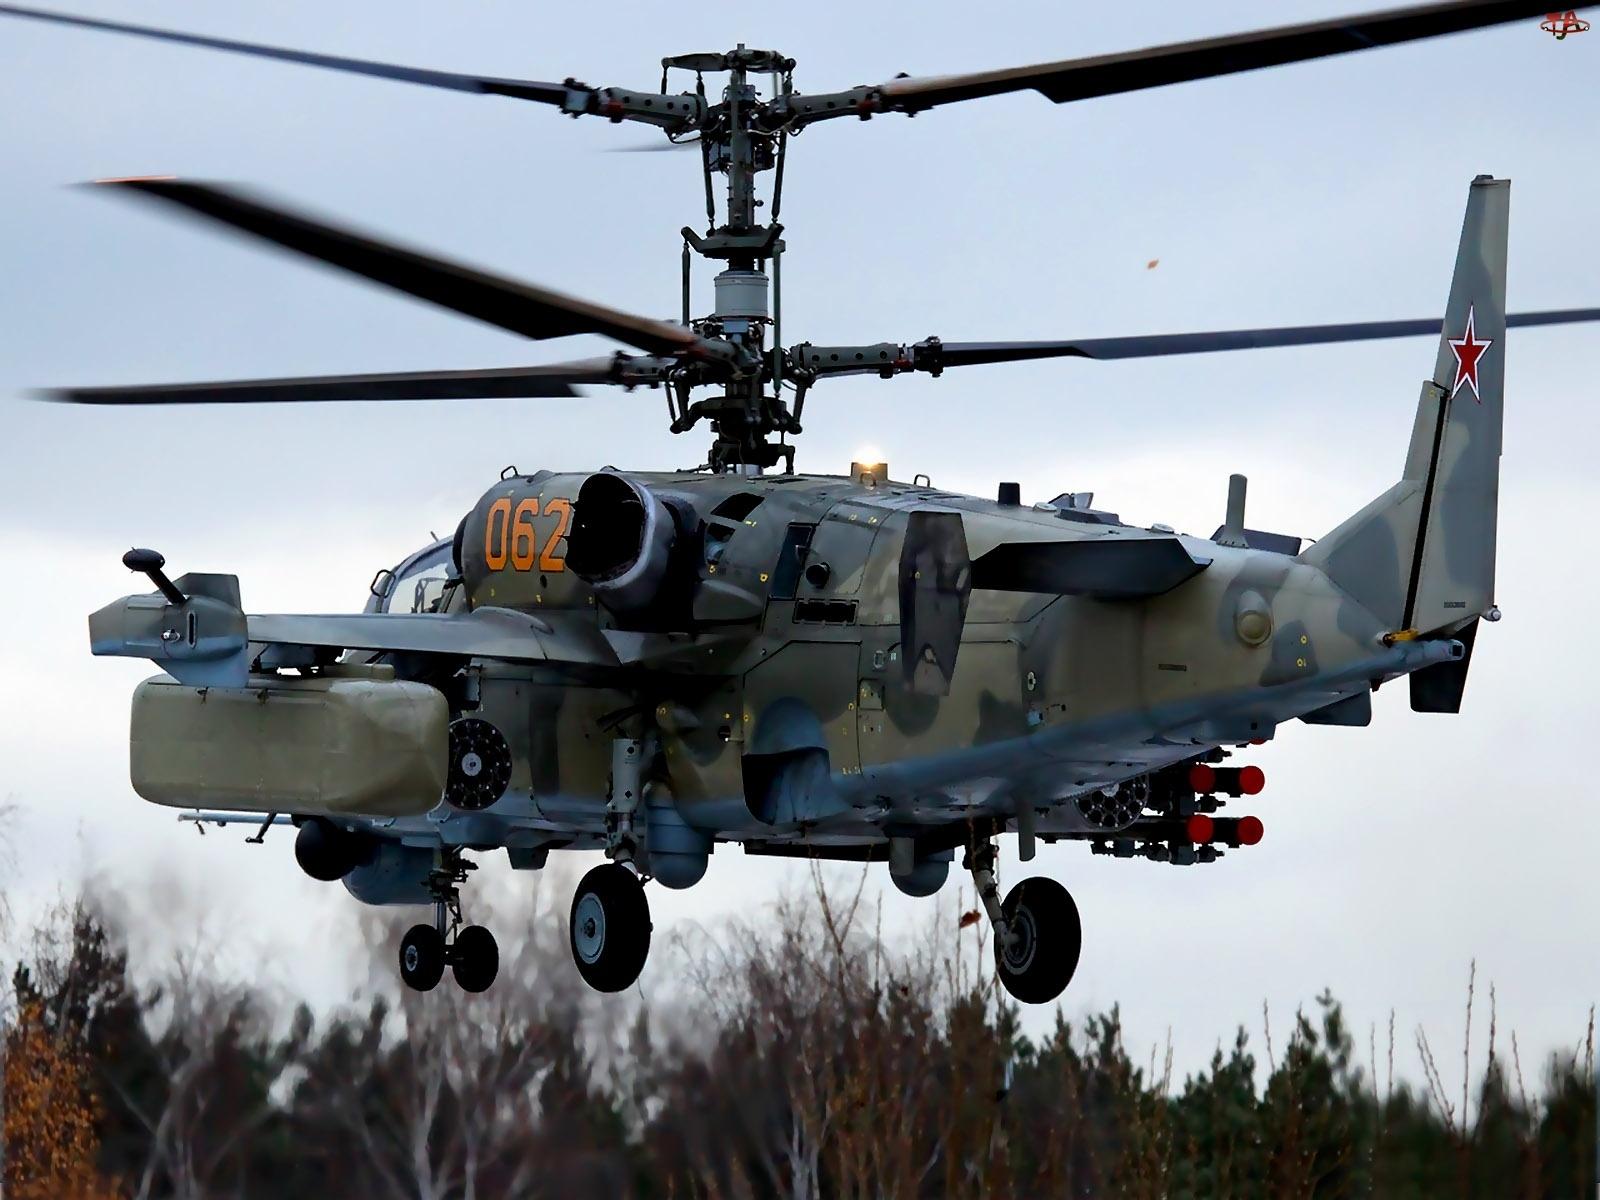 Wirniki, Helikopter, Ka-52, Kamov, Dwa